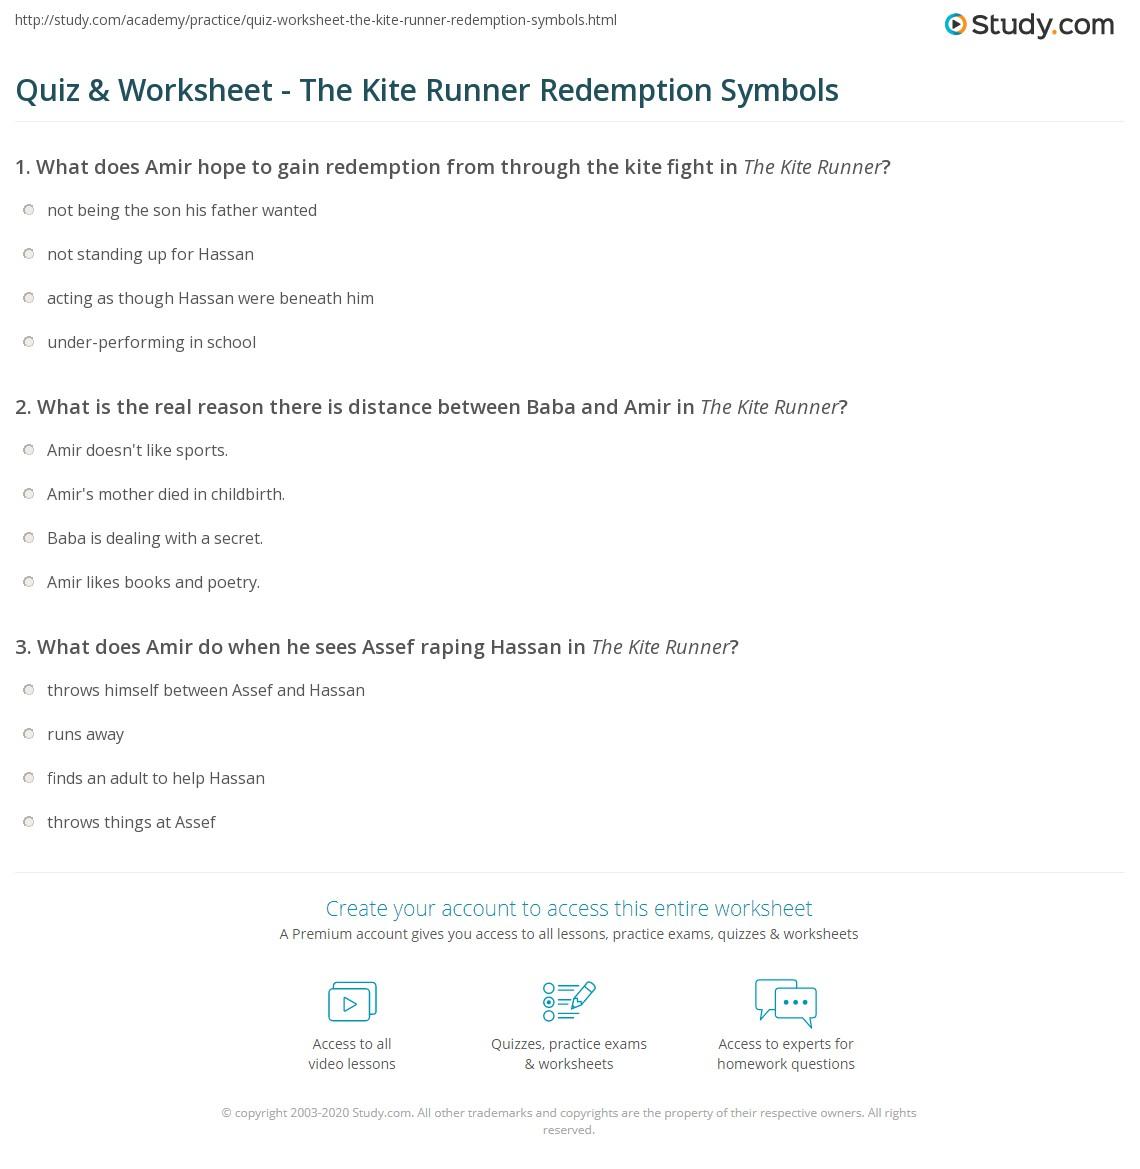 kite runner examples of redemption kite aquatechnics biz quiz worksheet the kite runner redemption symbols study com